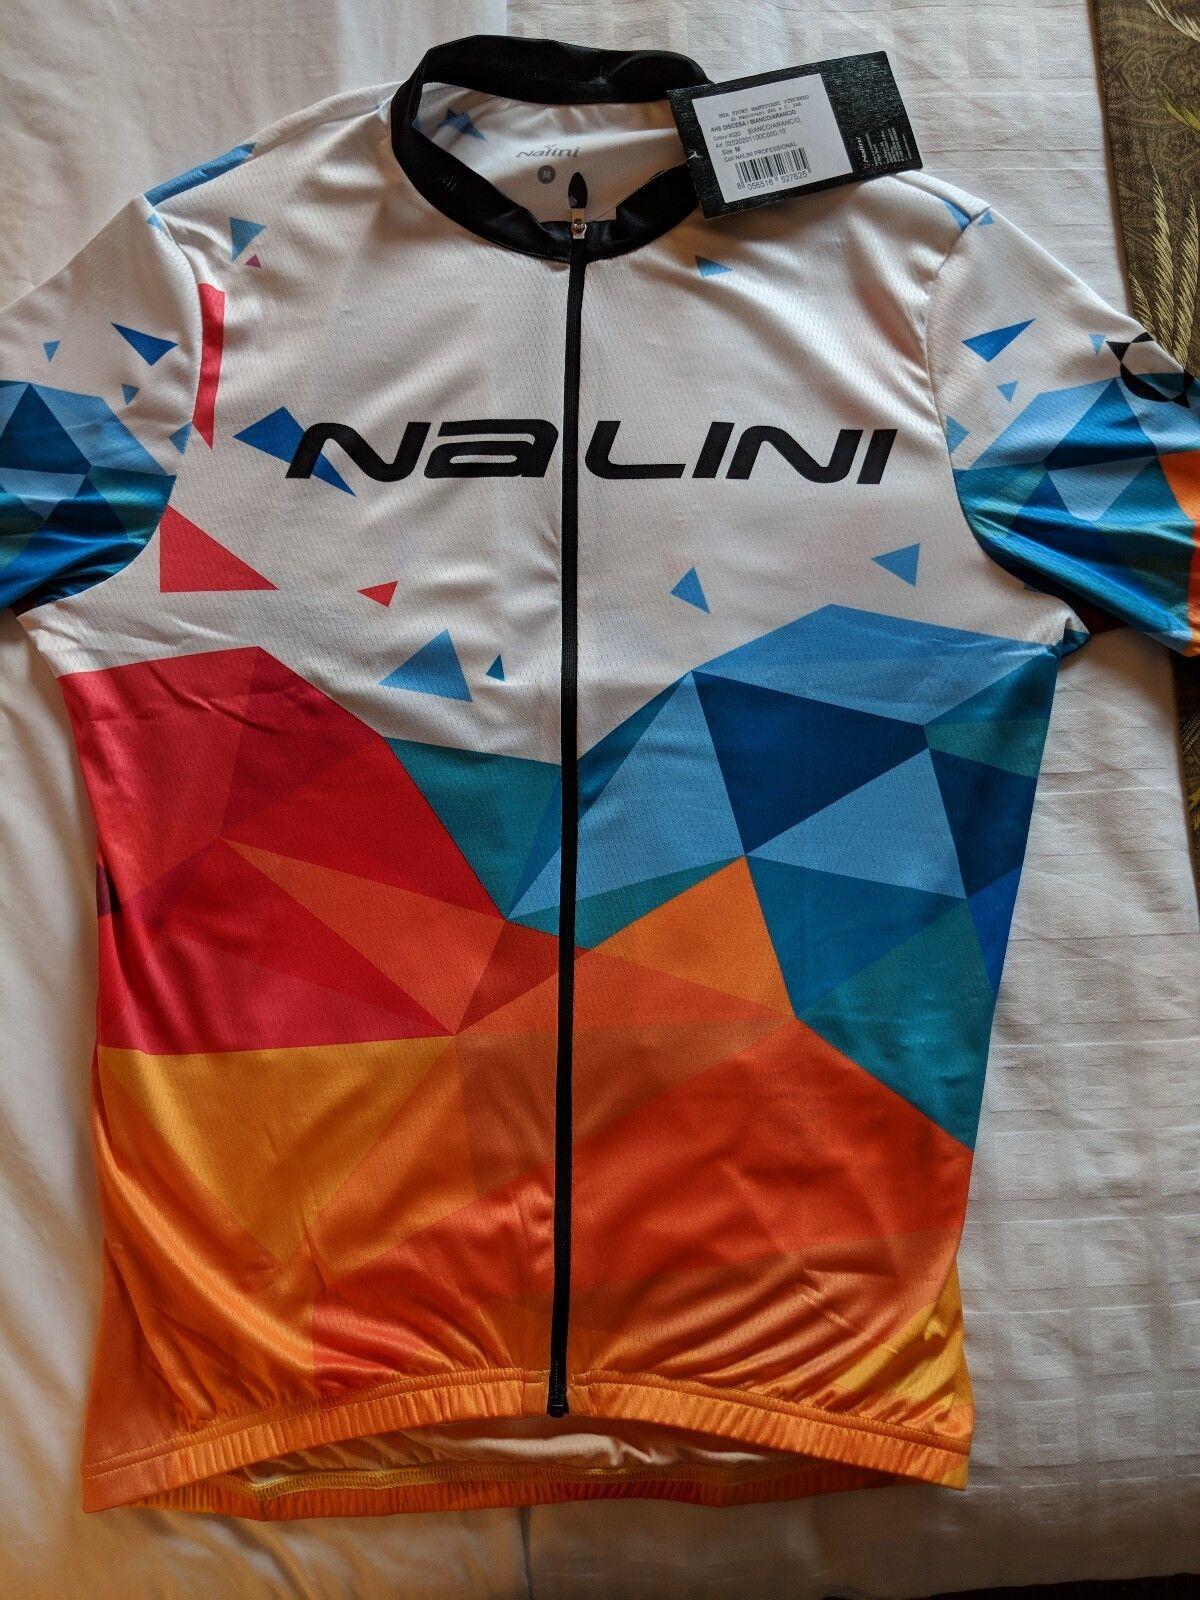 Nalini Discesa Road Cycling jersey